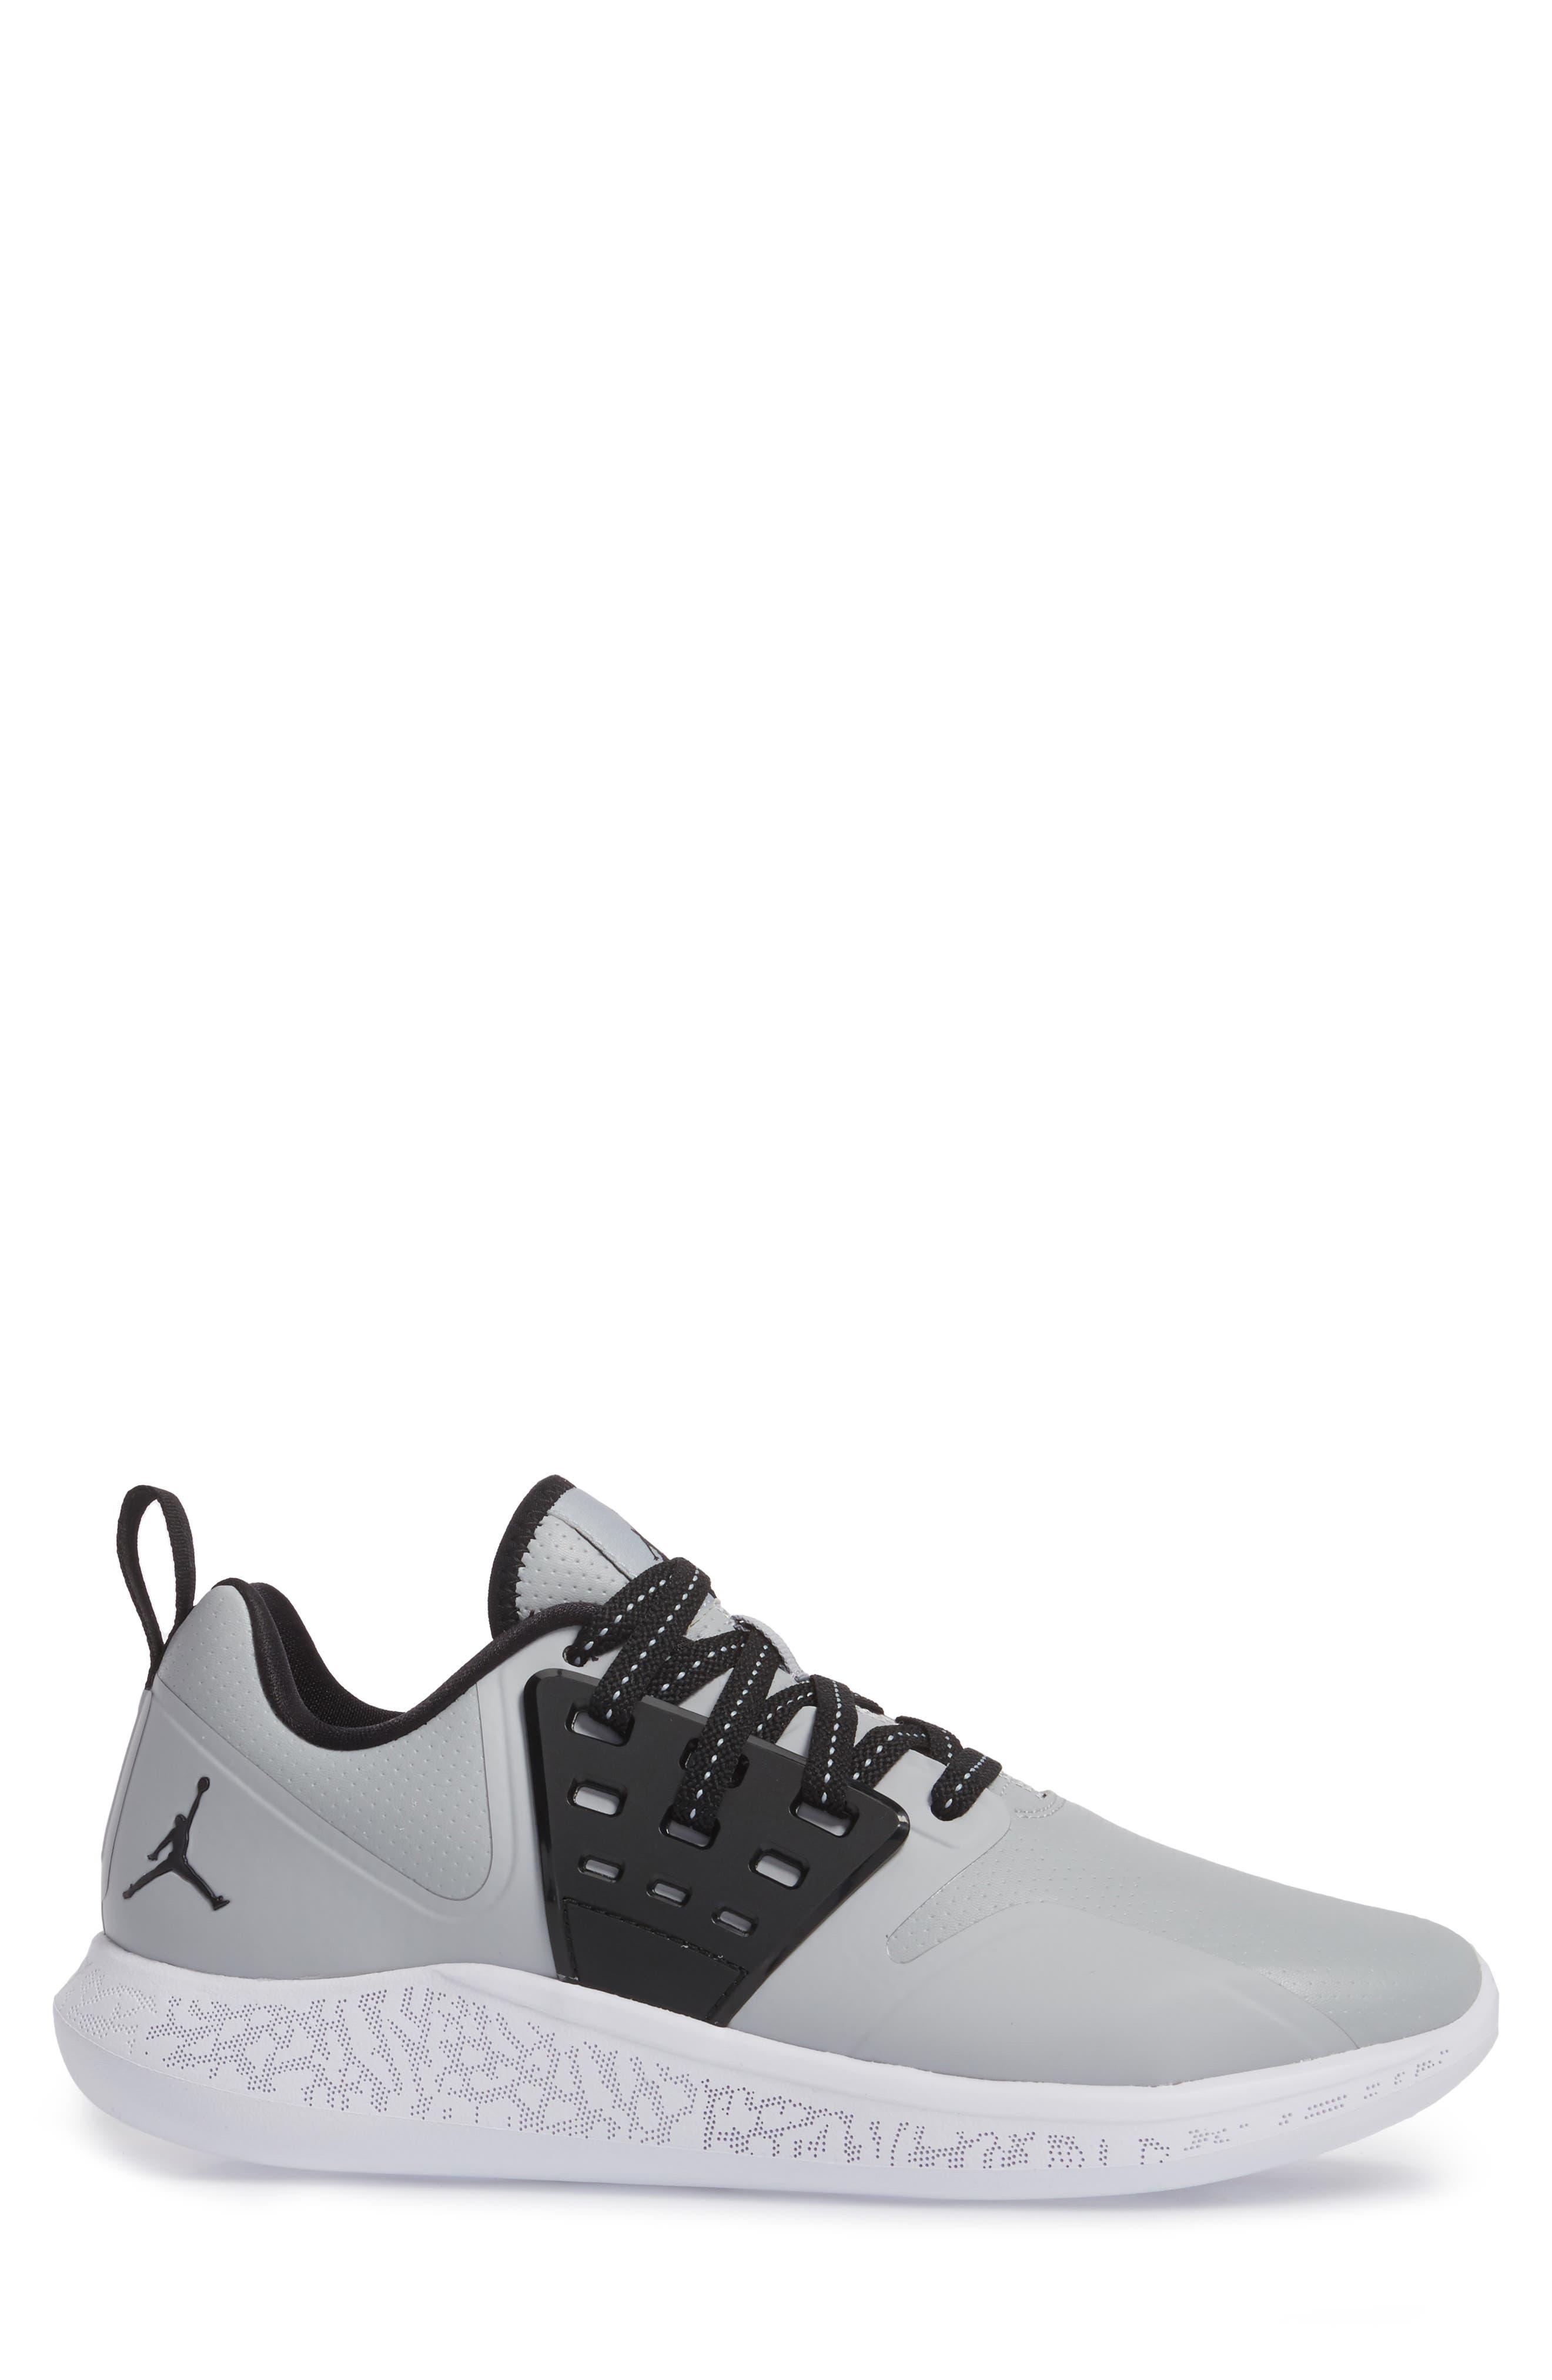 Jordan Grind Running Shoe,                             Alternate thumbnail 3, color,                             Wolf Grey/ Black/ White